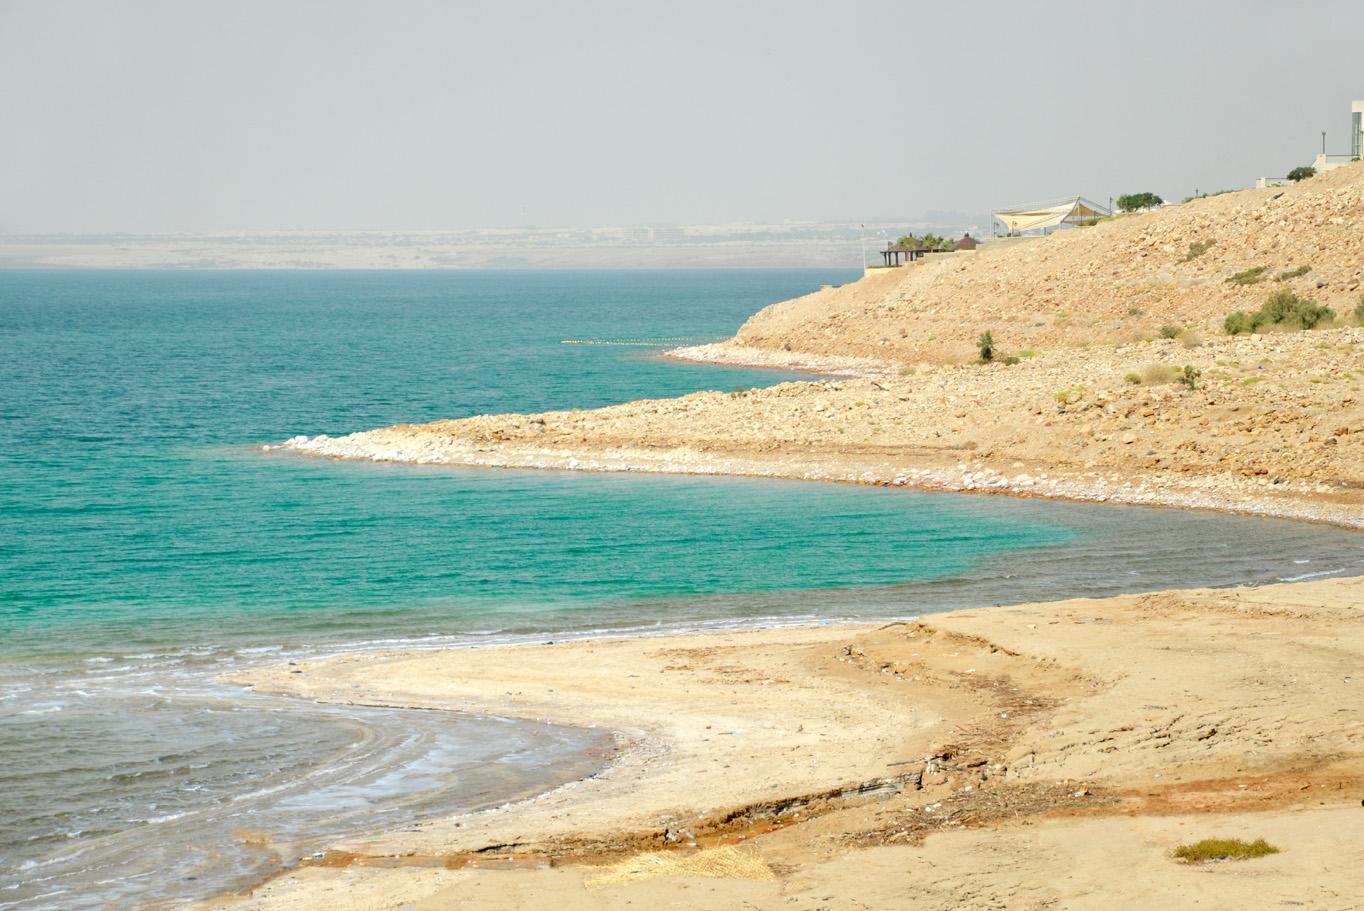 Barren shores